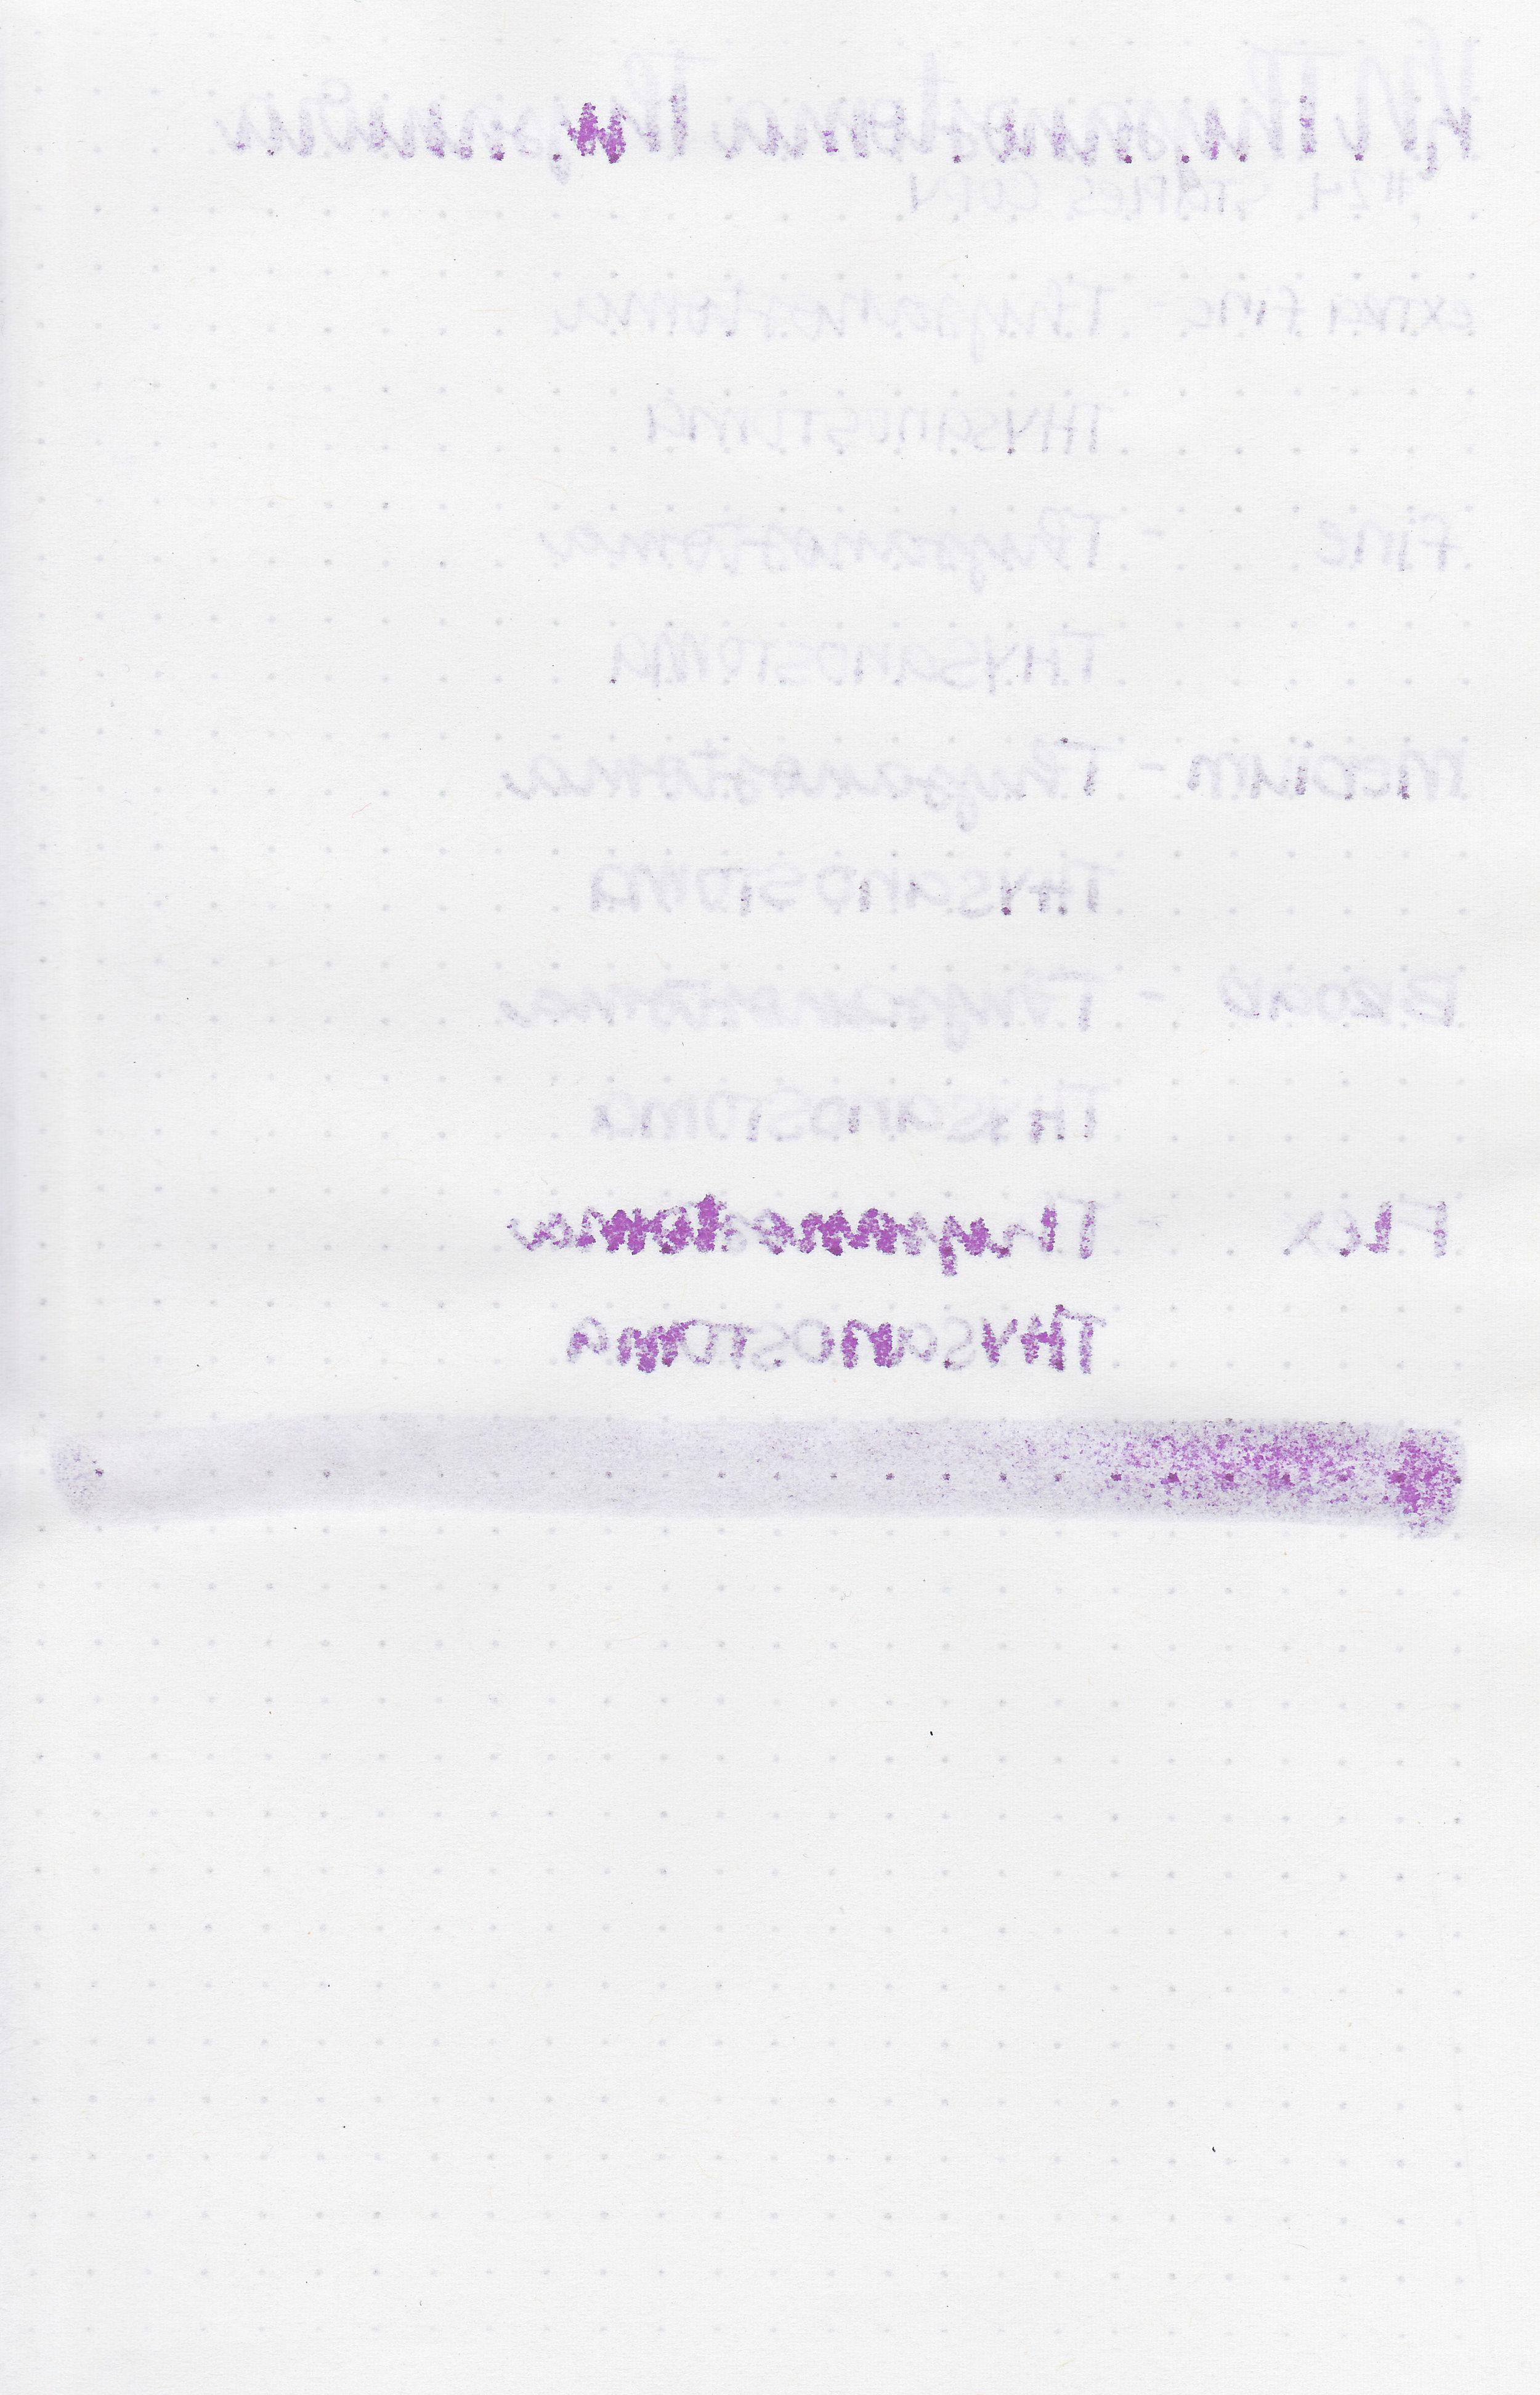 kn-thysanostoma-thysanura-10.jpg